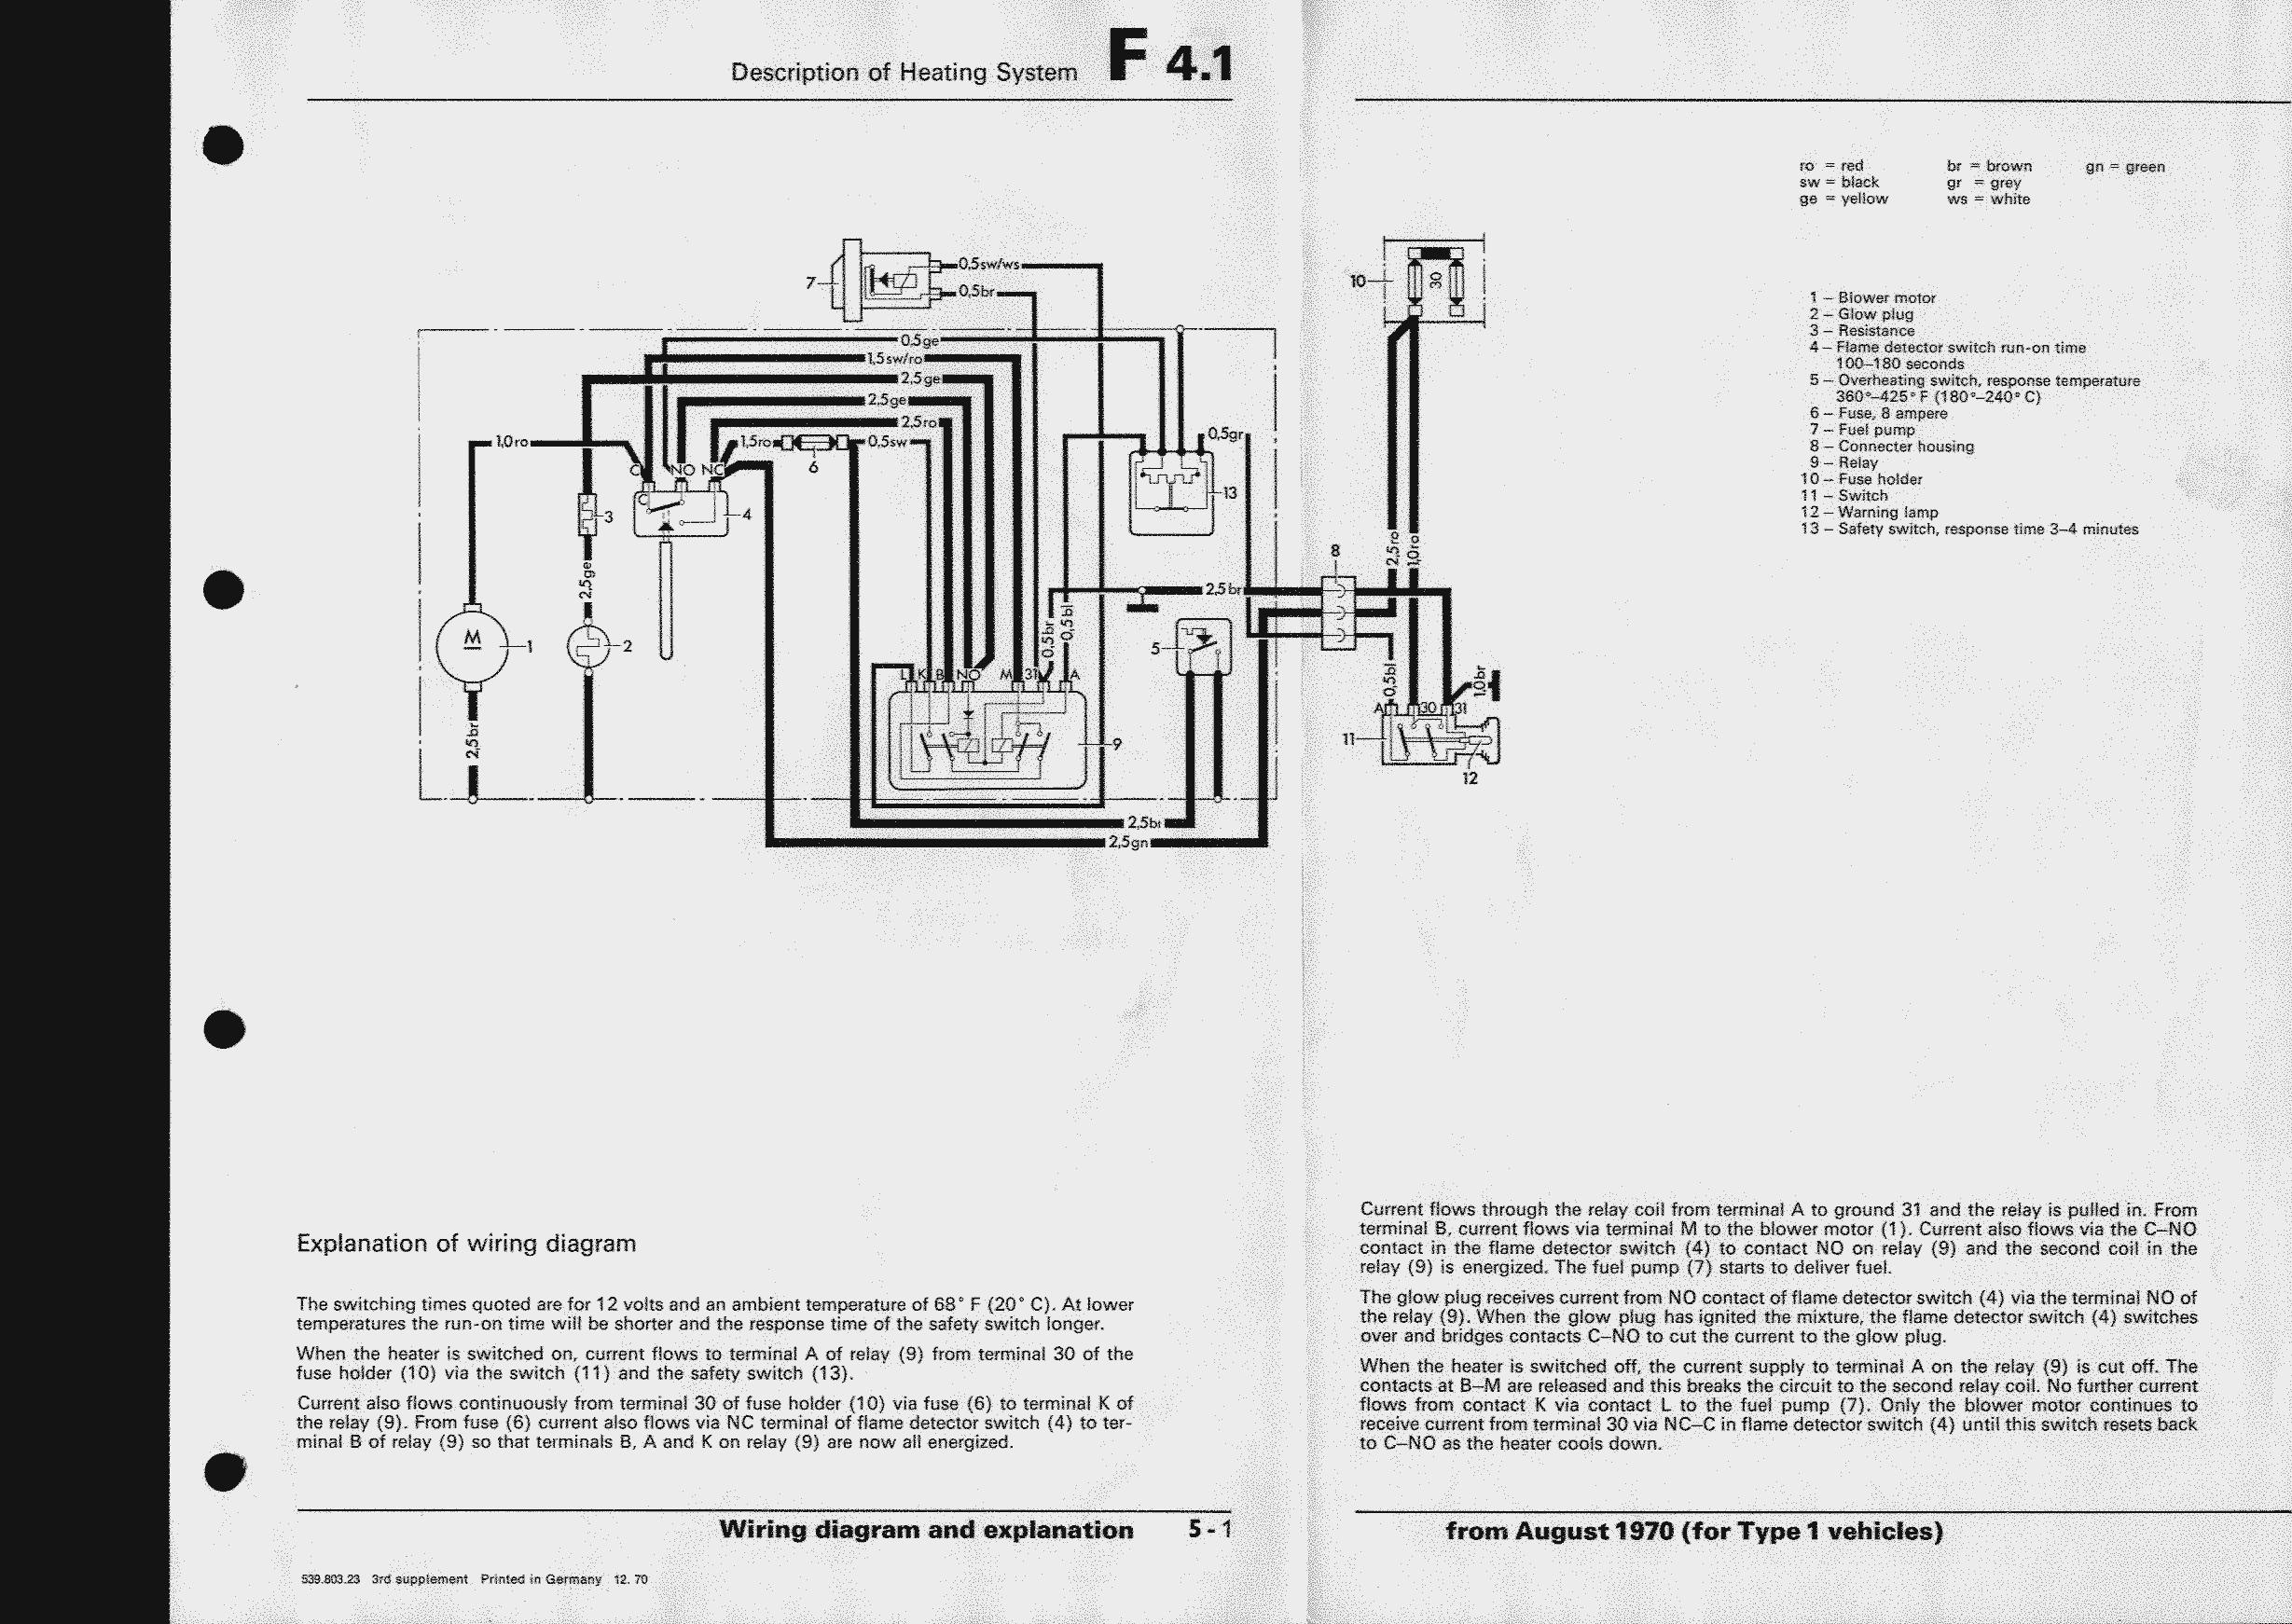 66 Vw Beetle Engine Diagram Wiring Diagrams 99 Type 3 Imageresizertool Com 1 1999